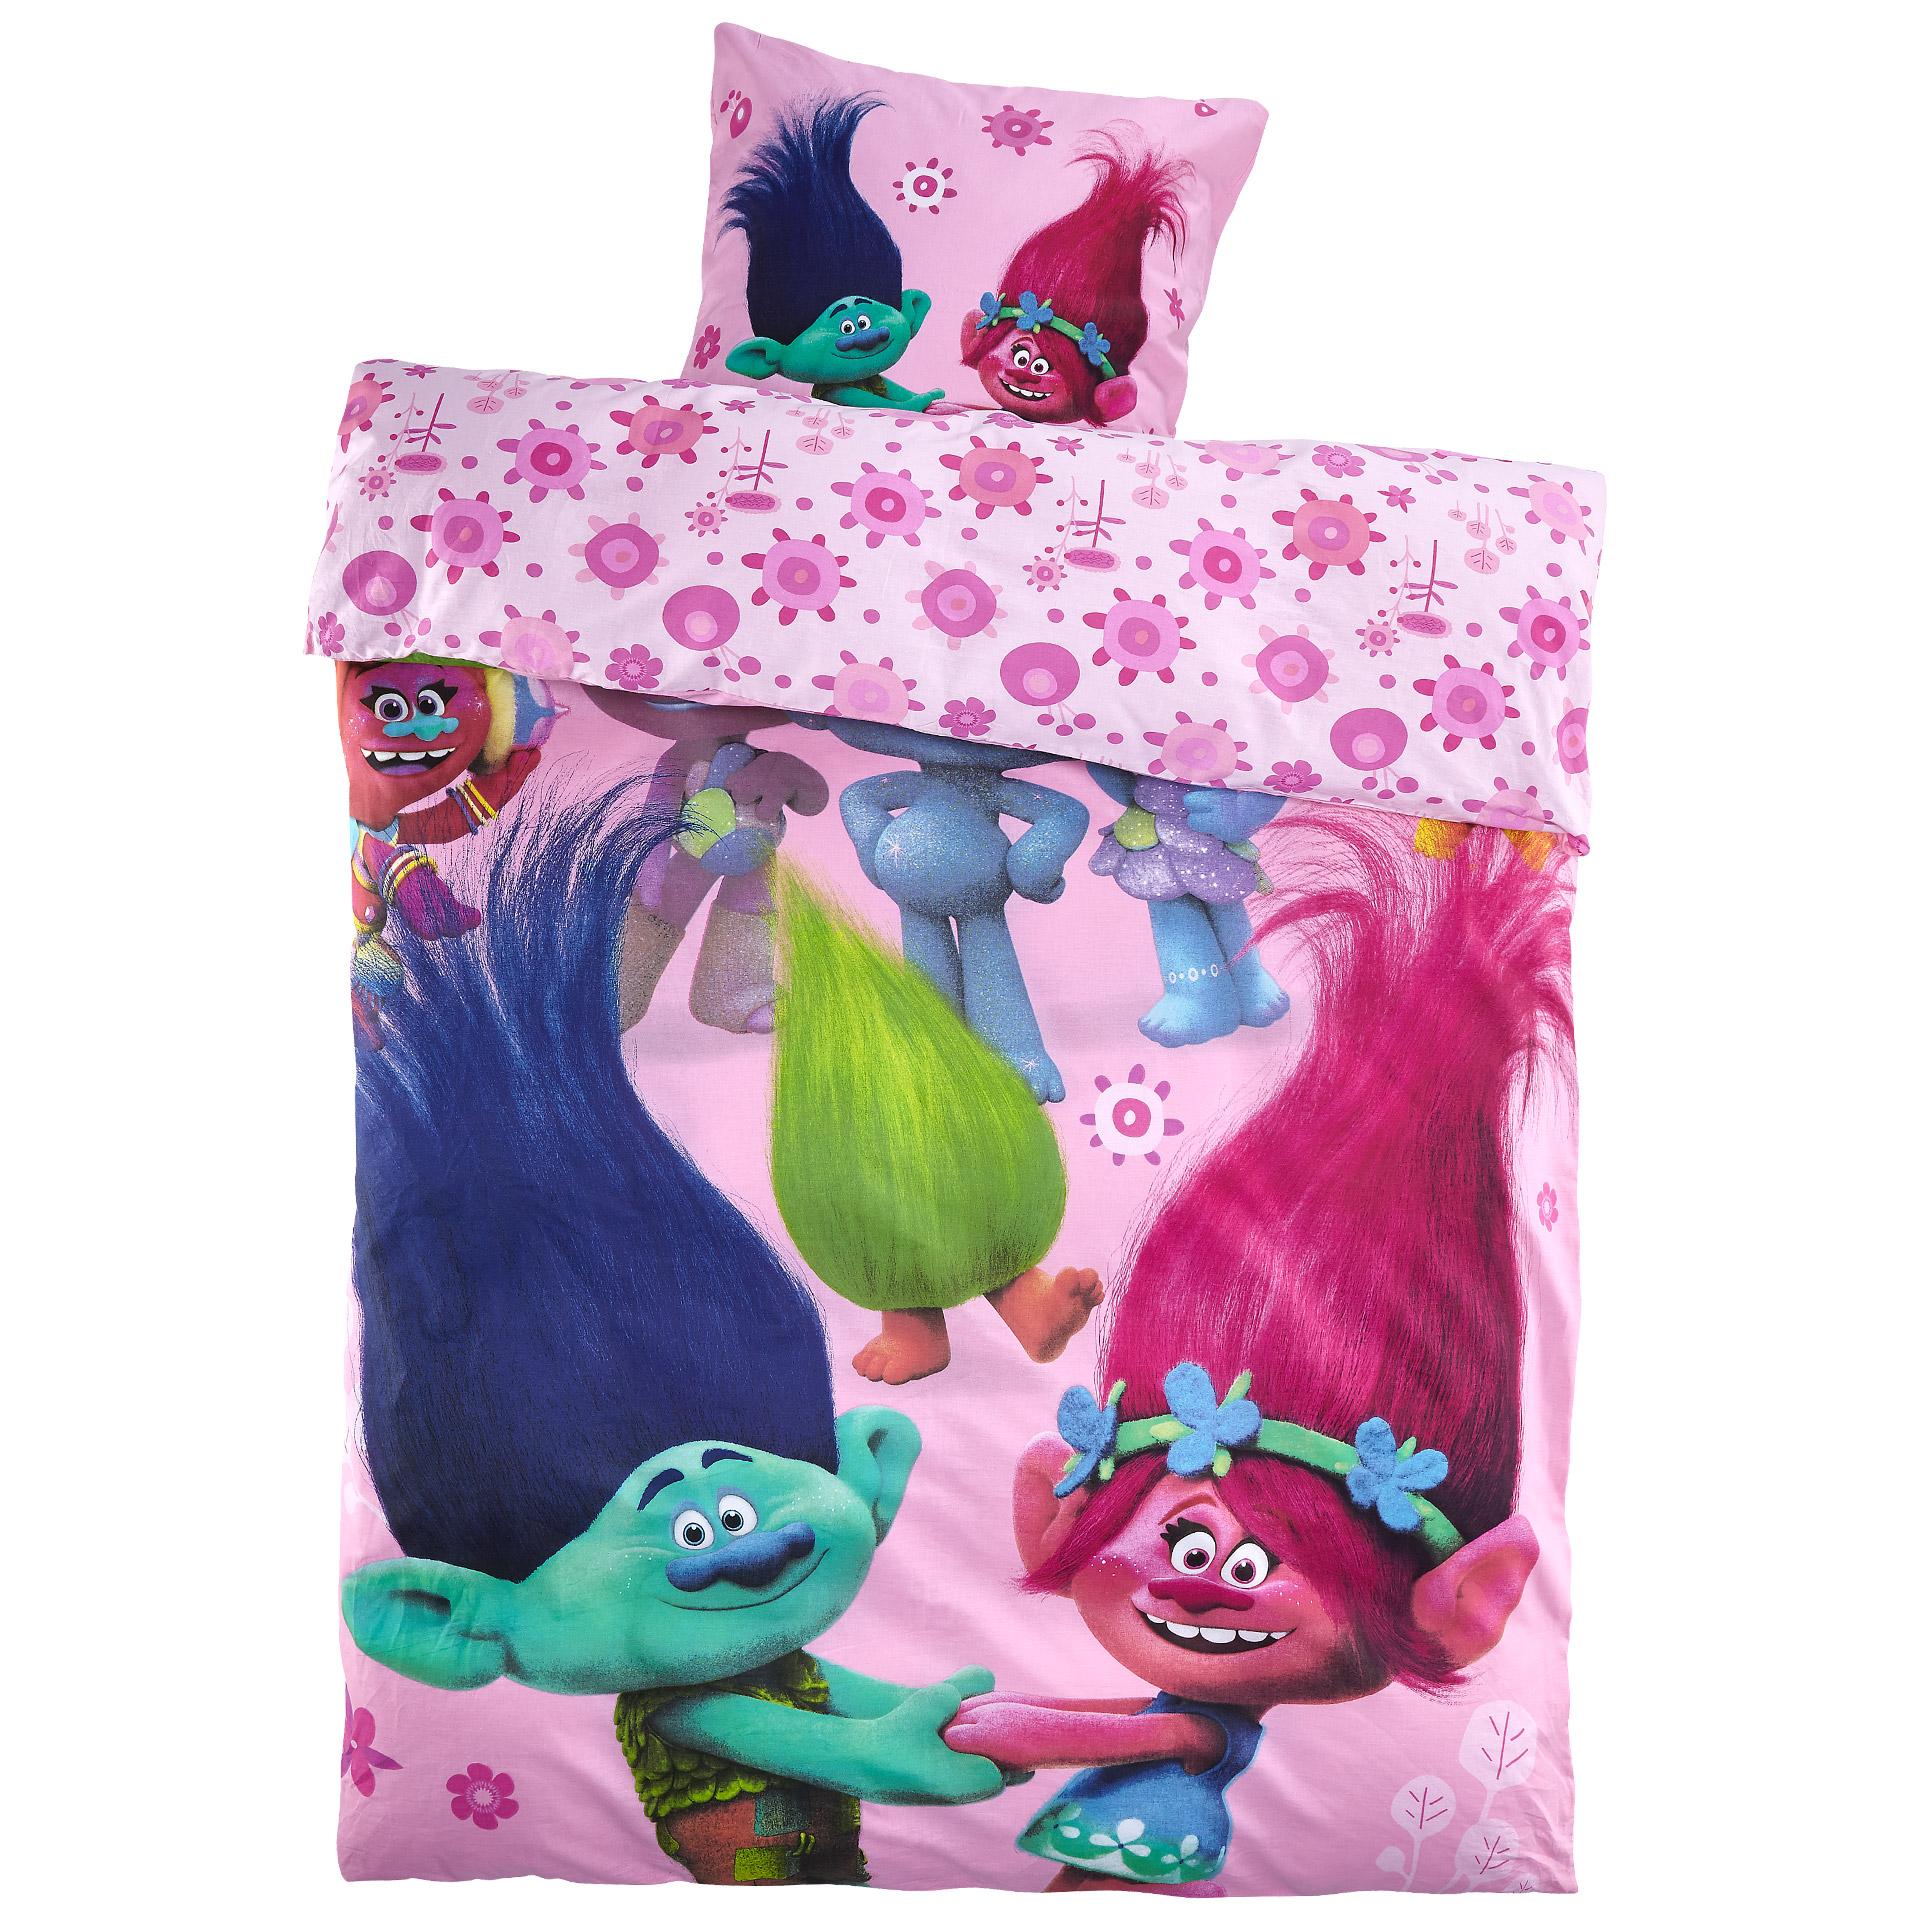 Kinderbettwäsche Trolls (135x200)